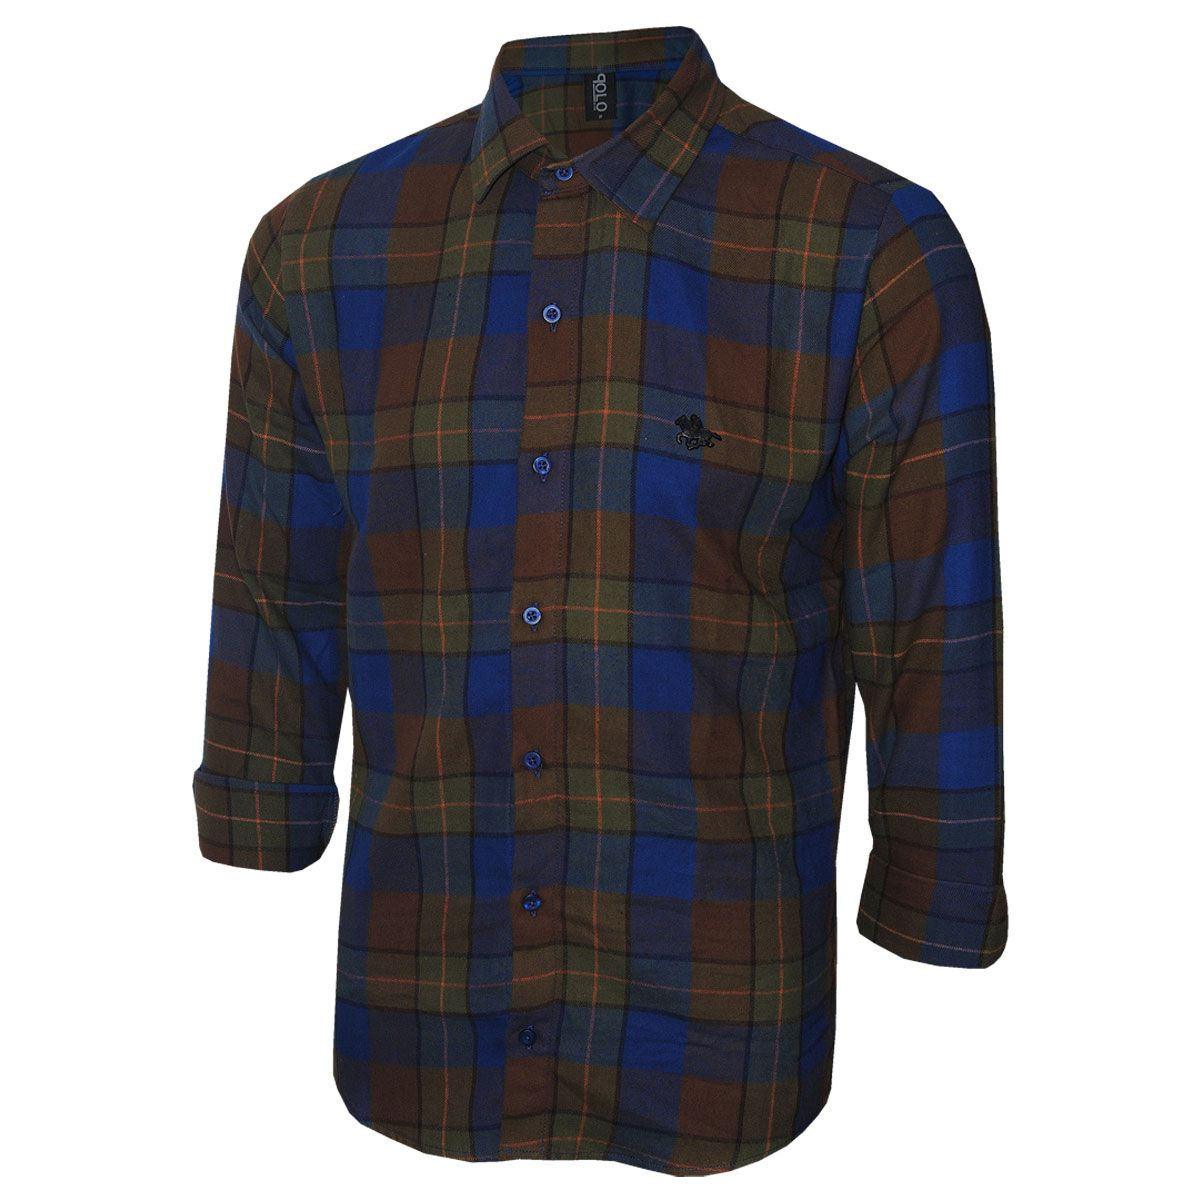 Camisa Masculina Polo RG518 Flanelada